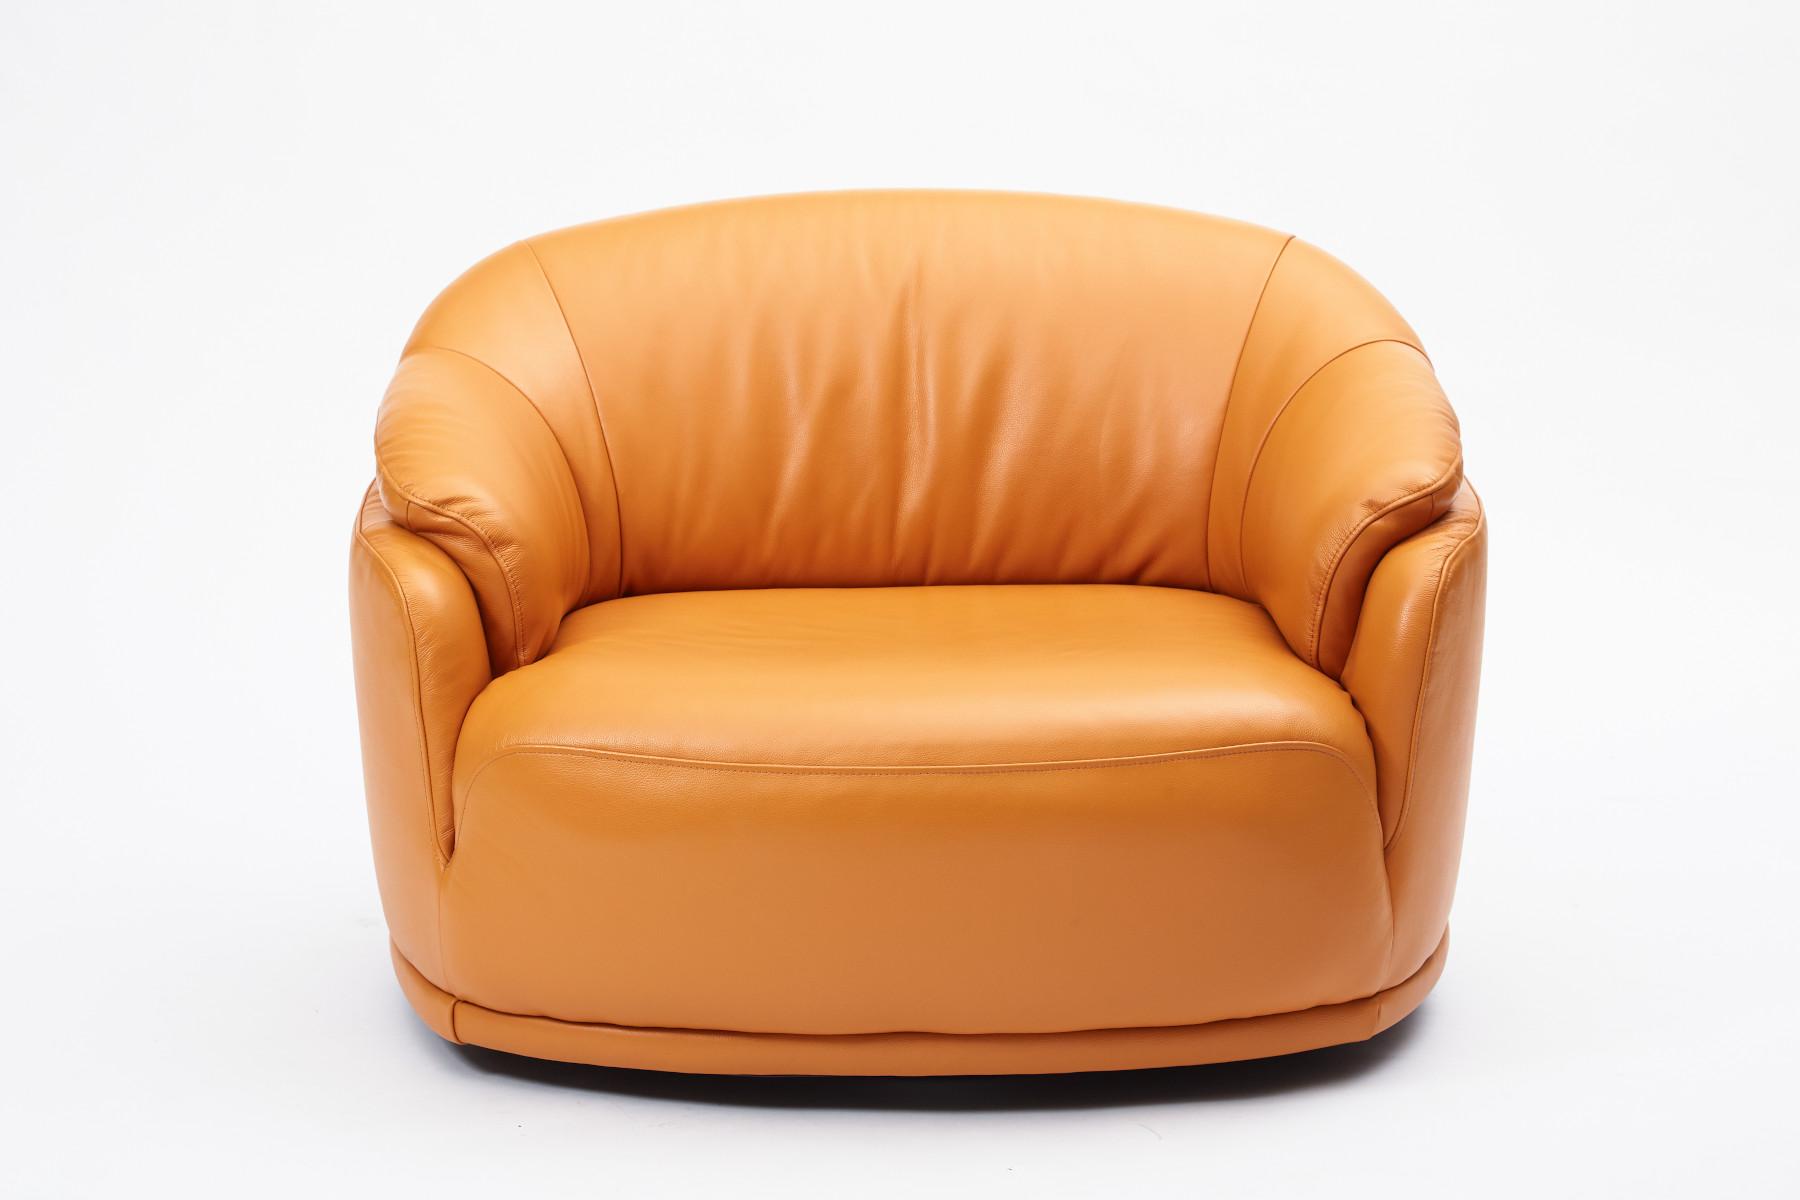 Digby Swivel Snuggler Chair